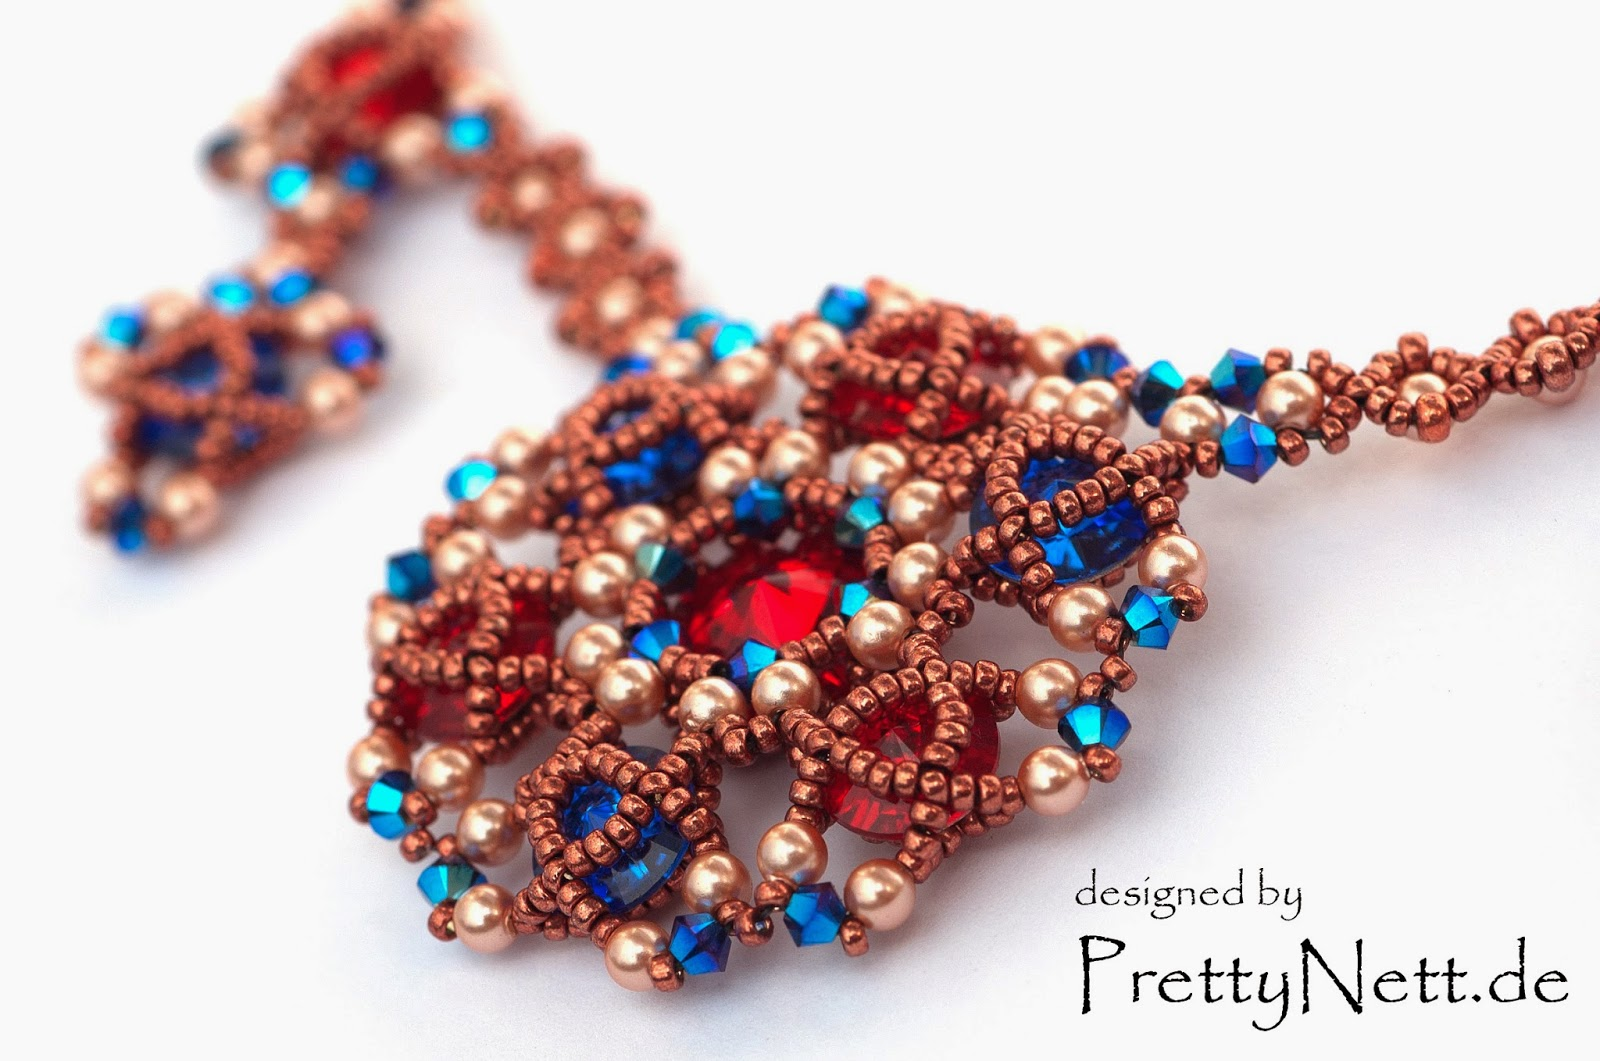 Necklace Arabesque designed by PrettyNett.de